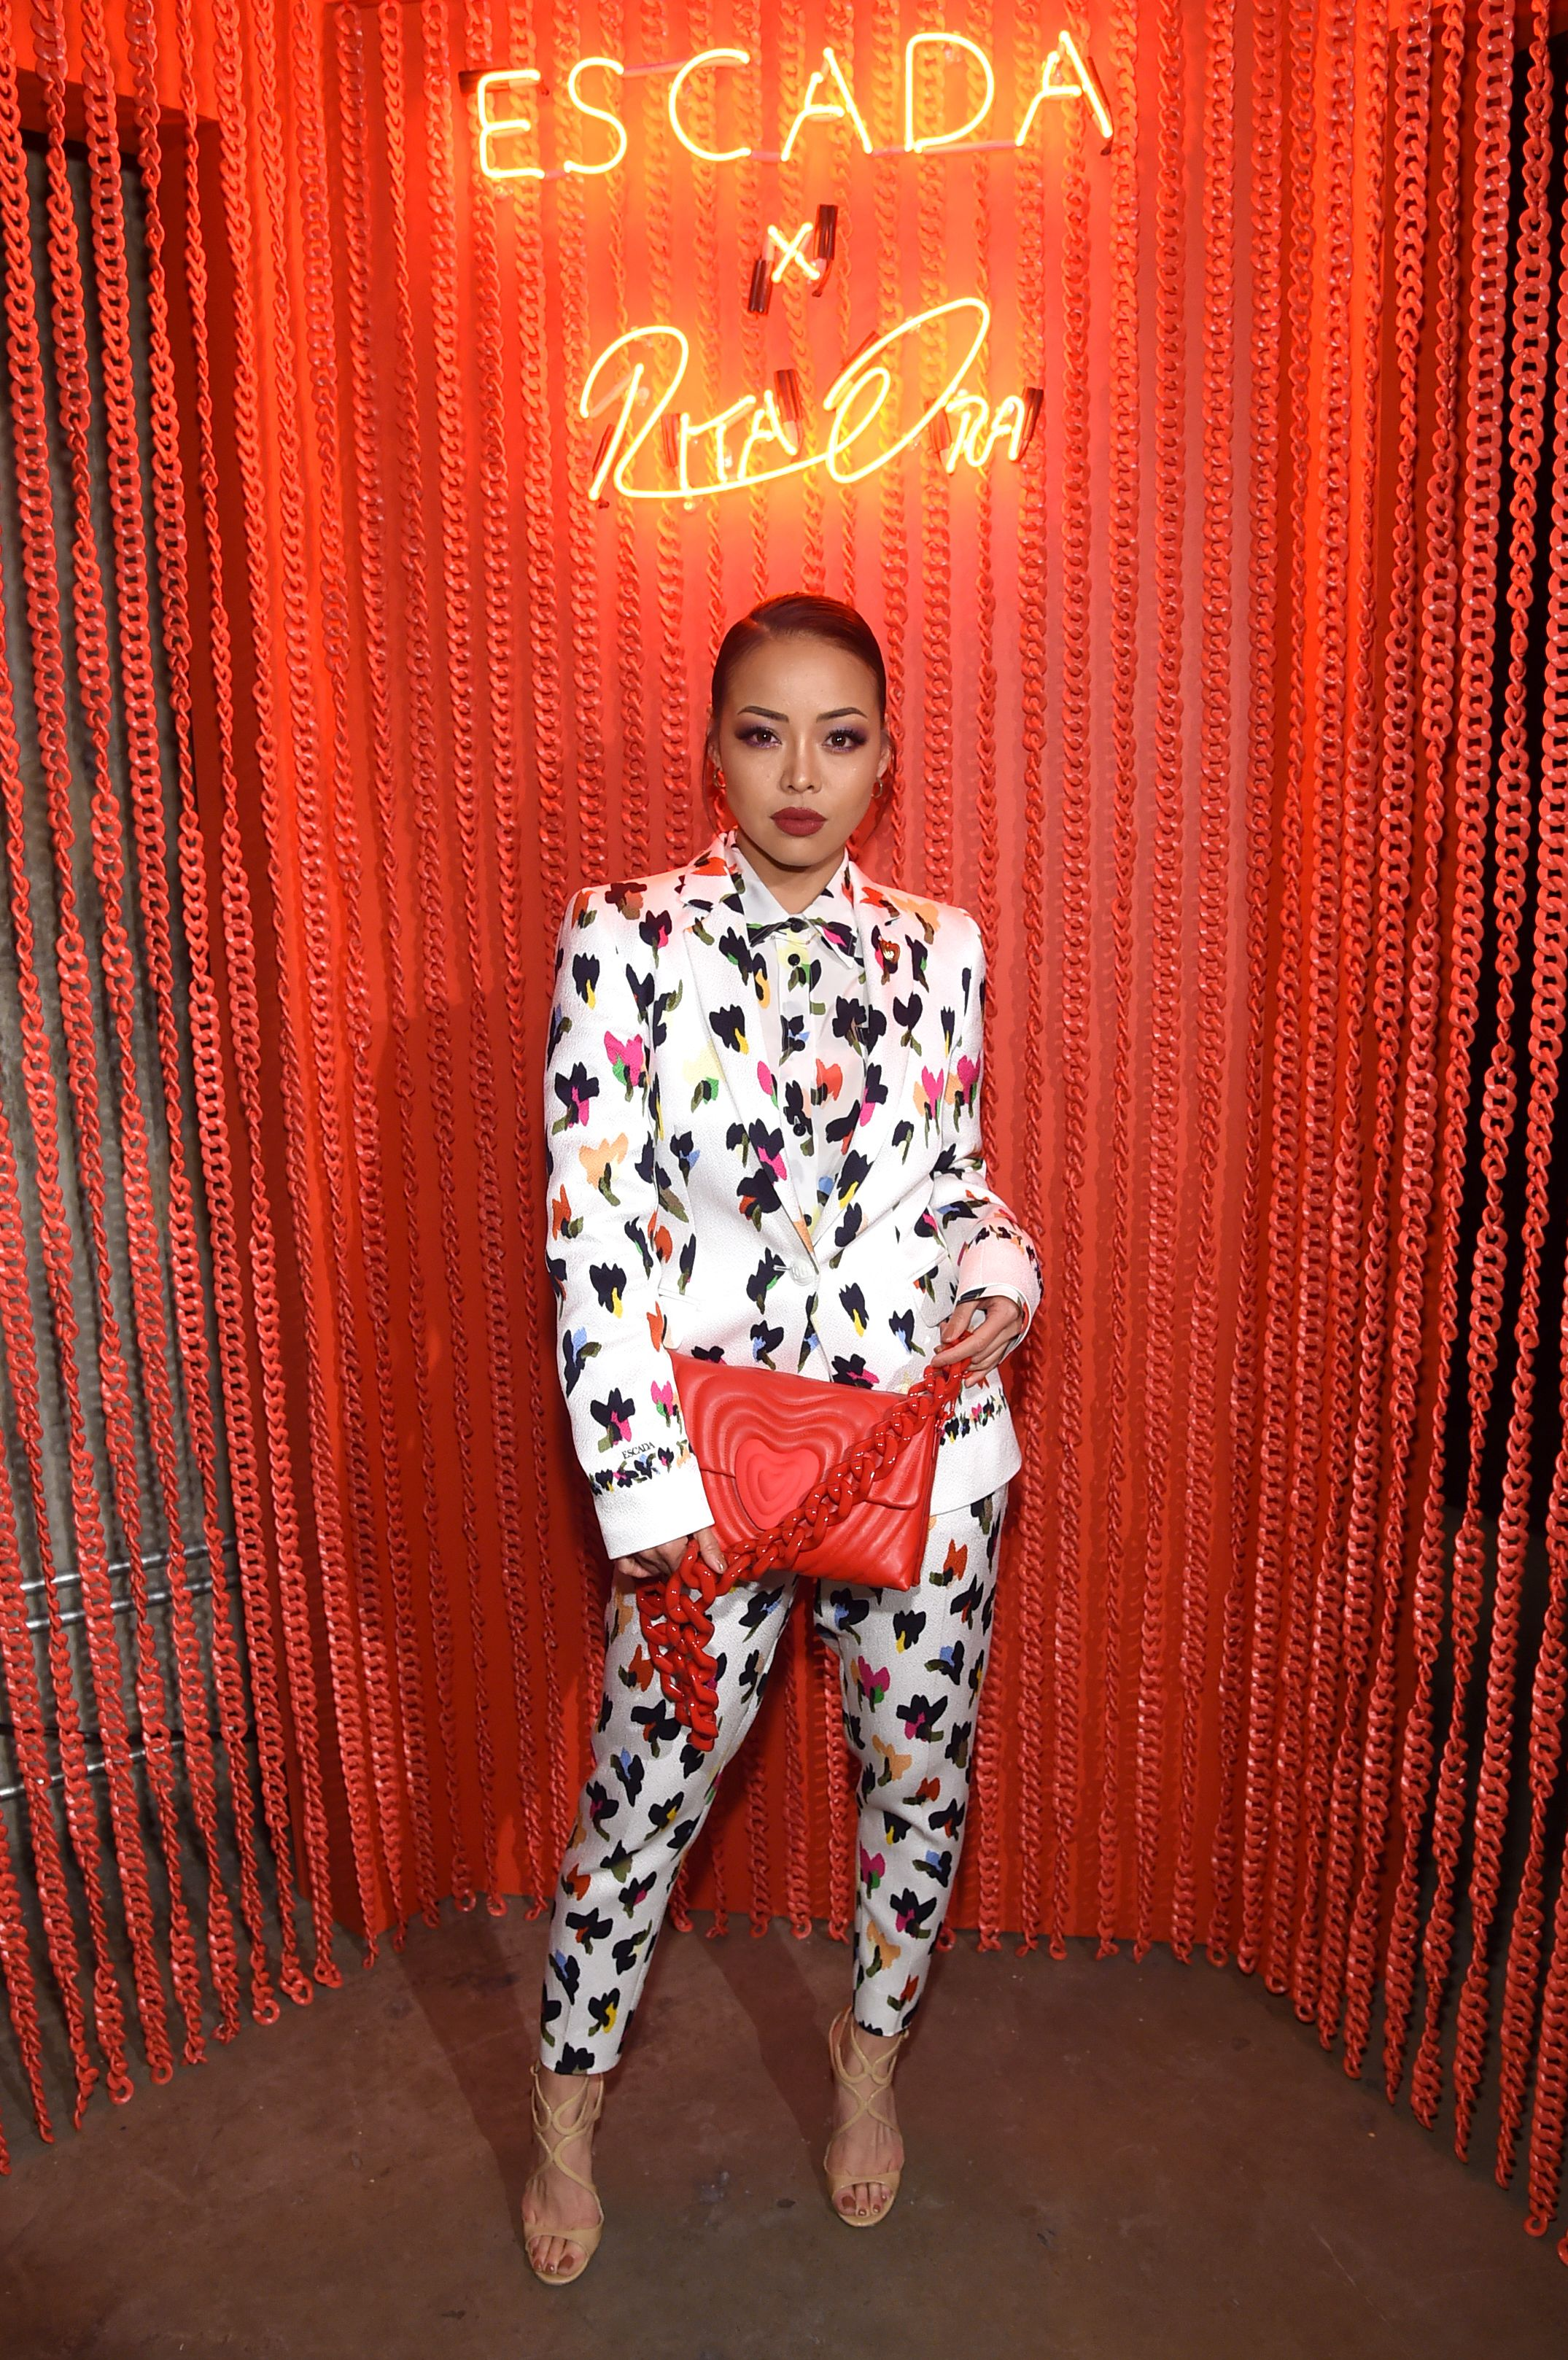 Maasa Ishihara Maasa Ishihara  attends the launch of the Escada Heartbag by Rita Ora on March 27 in New York City.